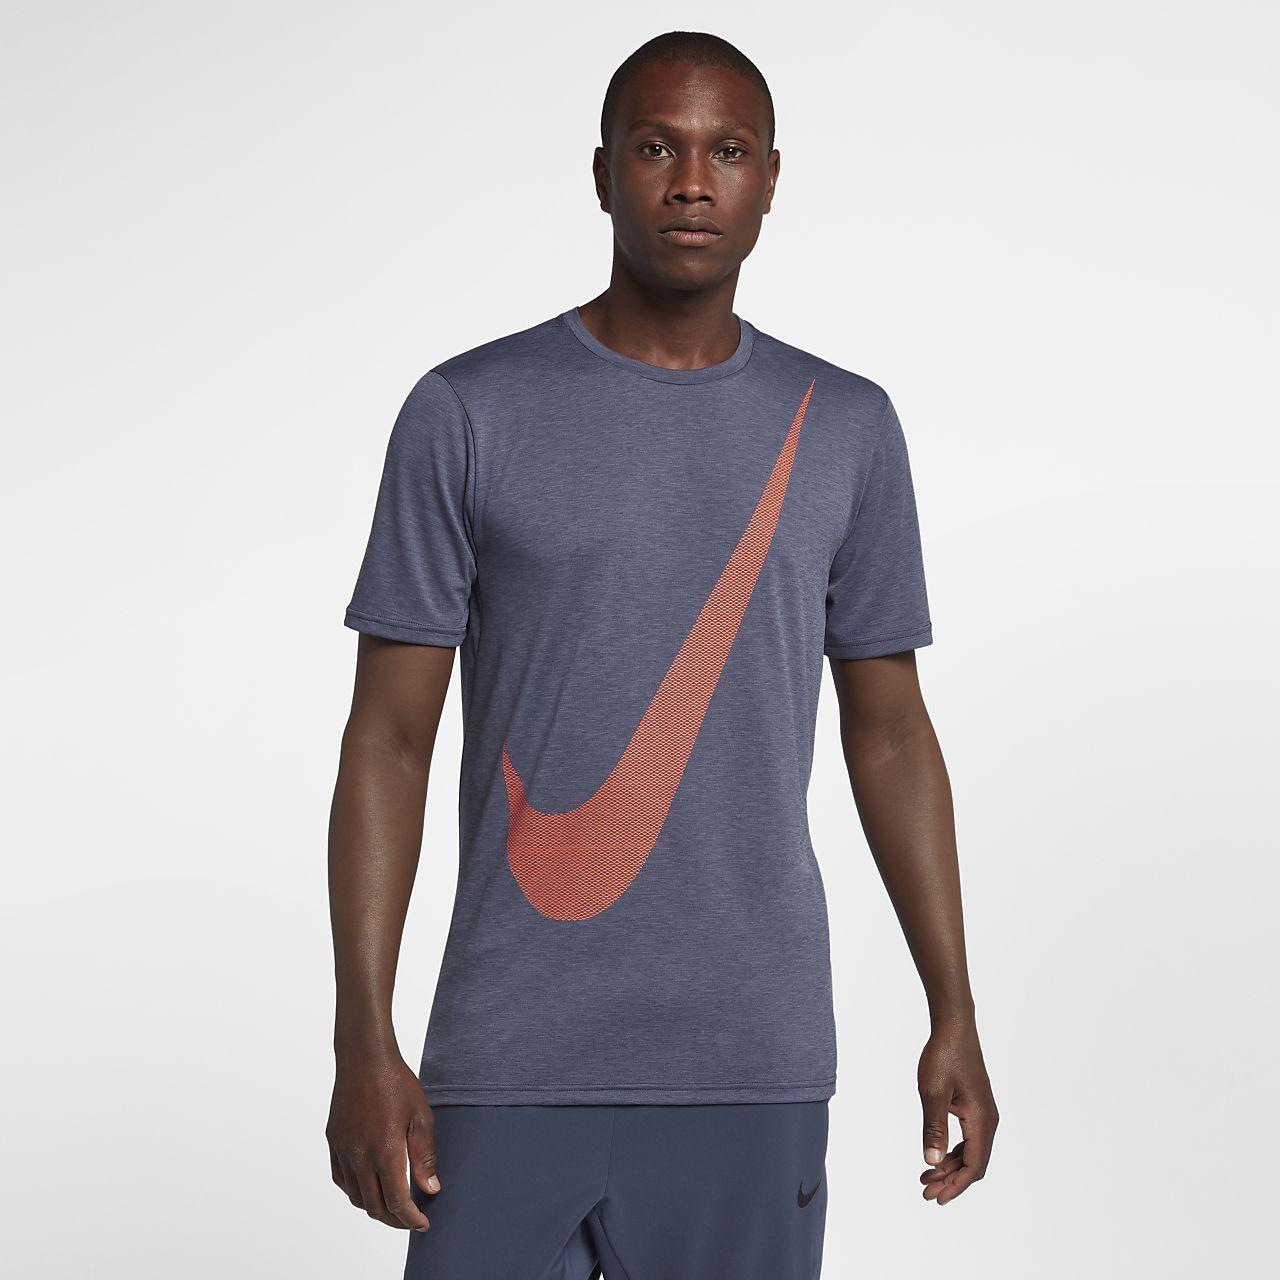 92930f874cbb2 Nike Run Breathe T Shirt Mens Review – Rockwall Auction